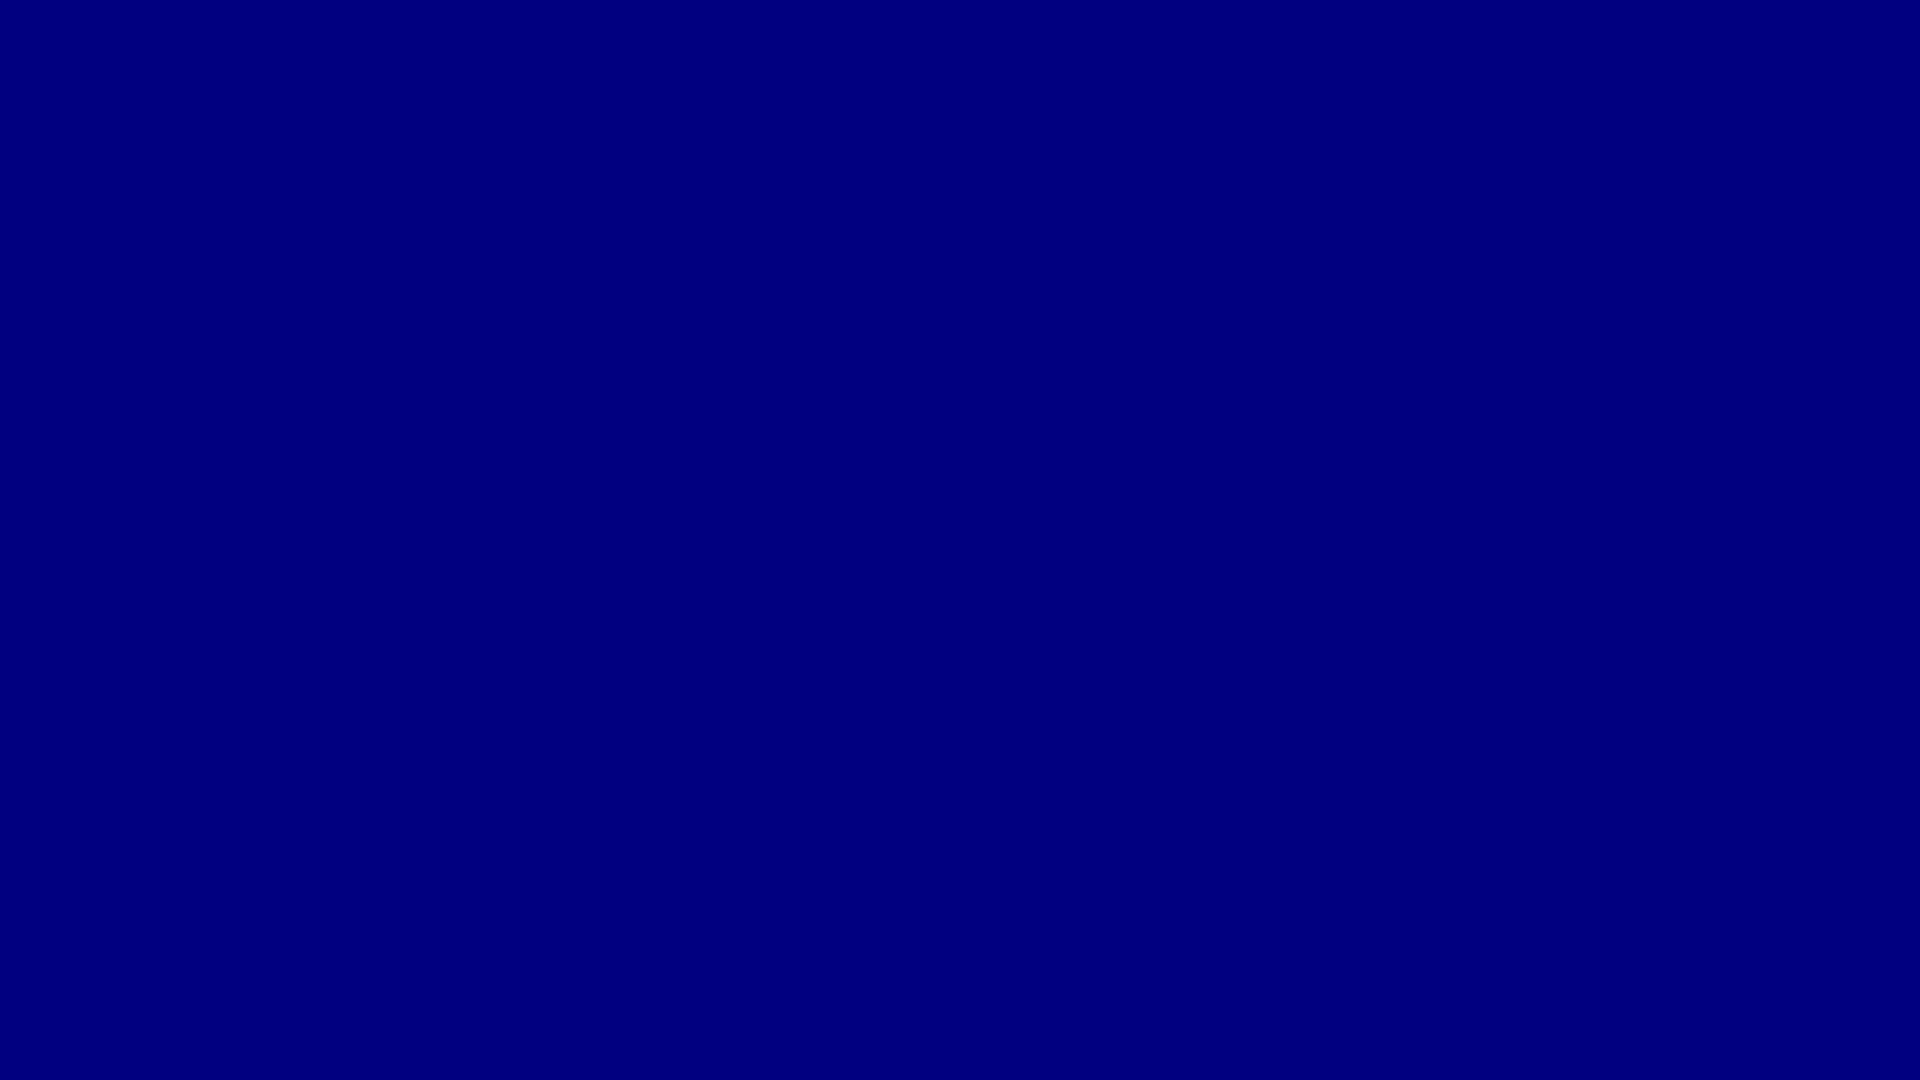 Navy Blue 1920x1080